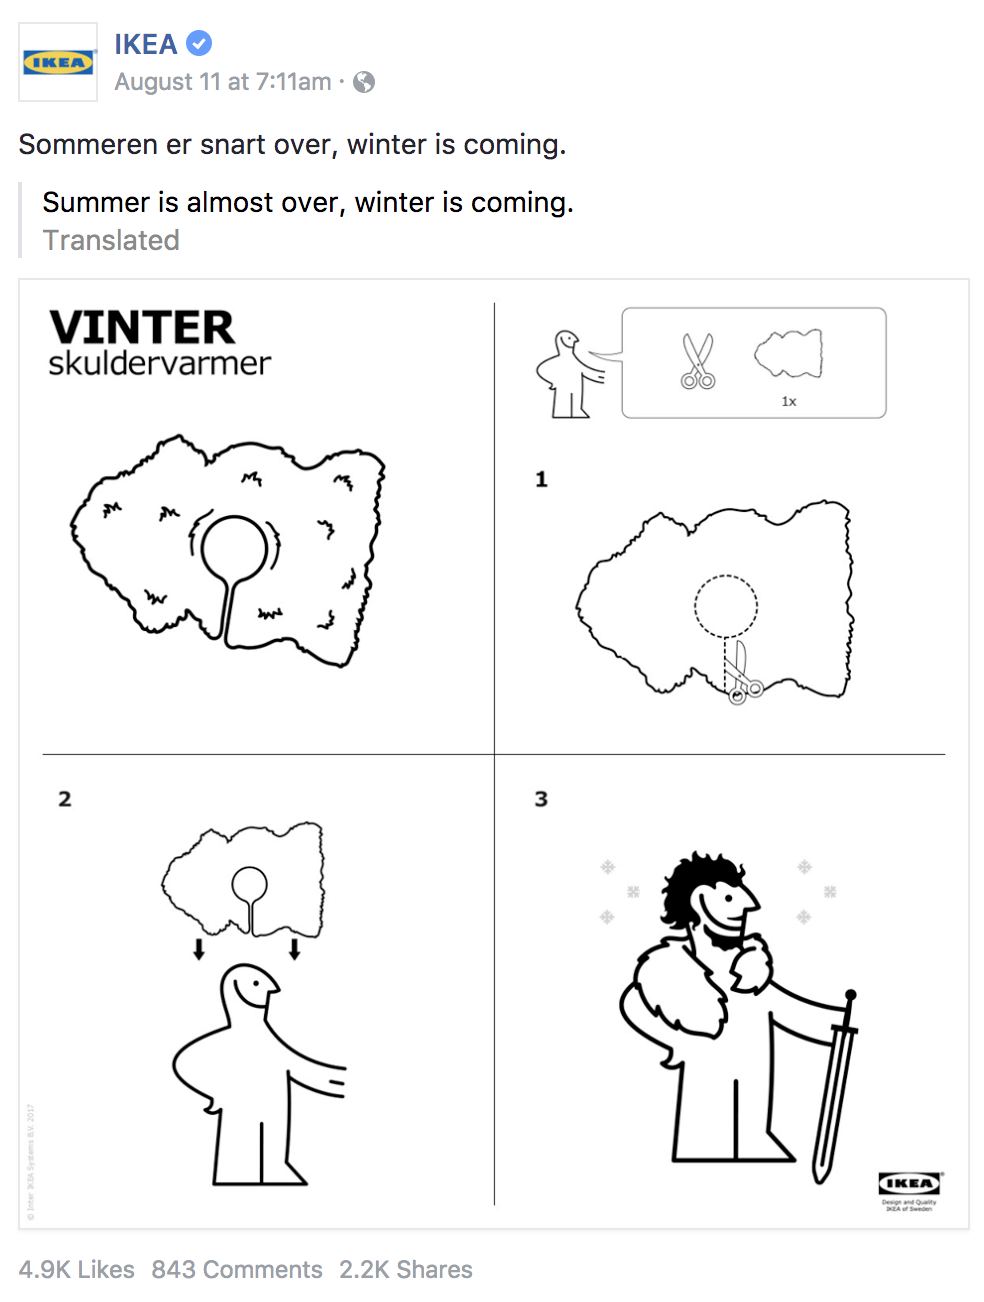 IKEA Game of thrones Facebook.png